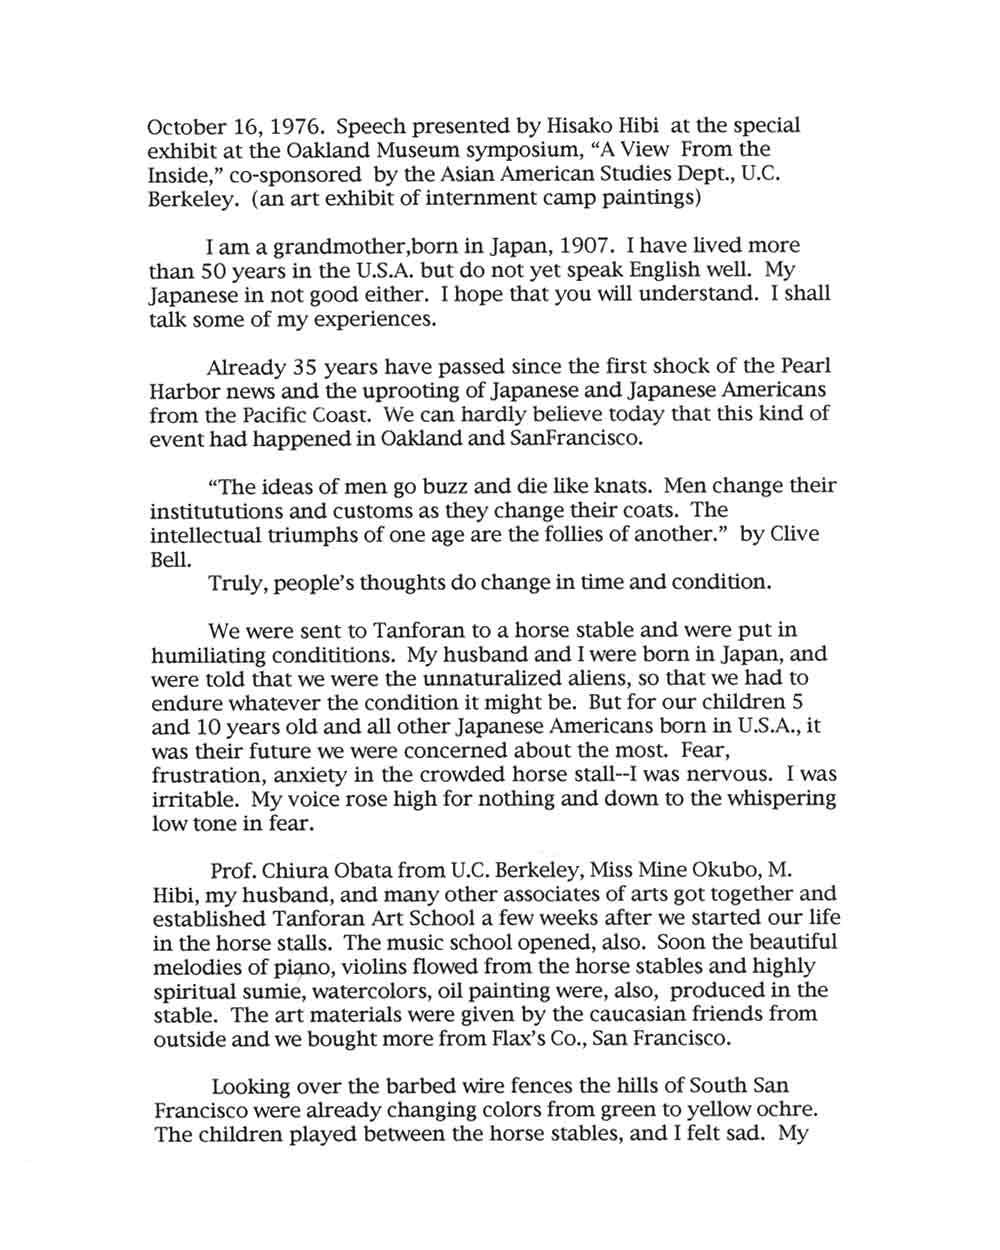 Hisako Hibi's speech, pg 1